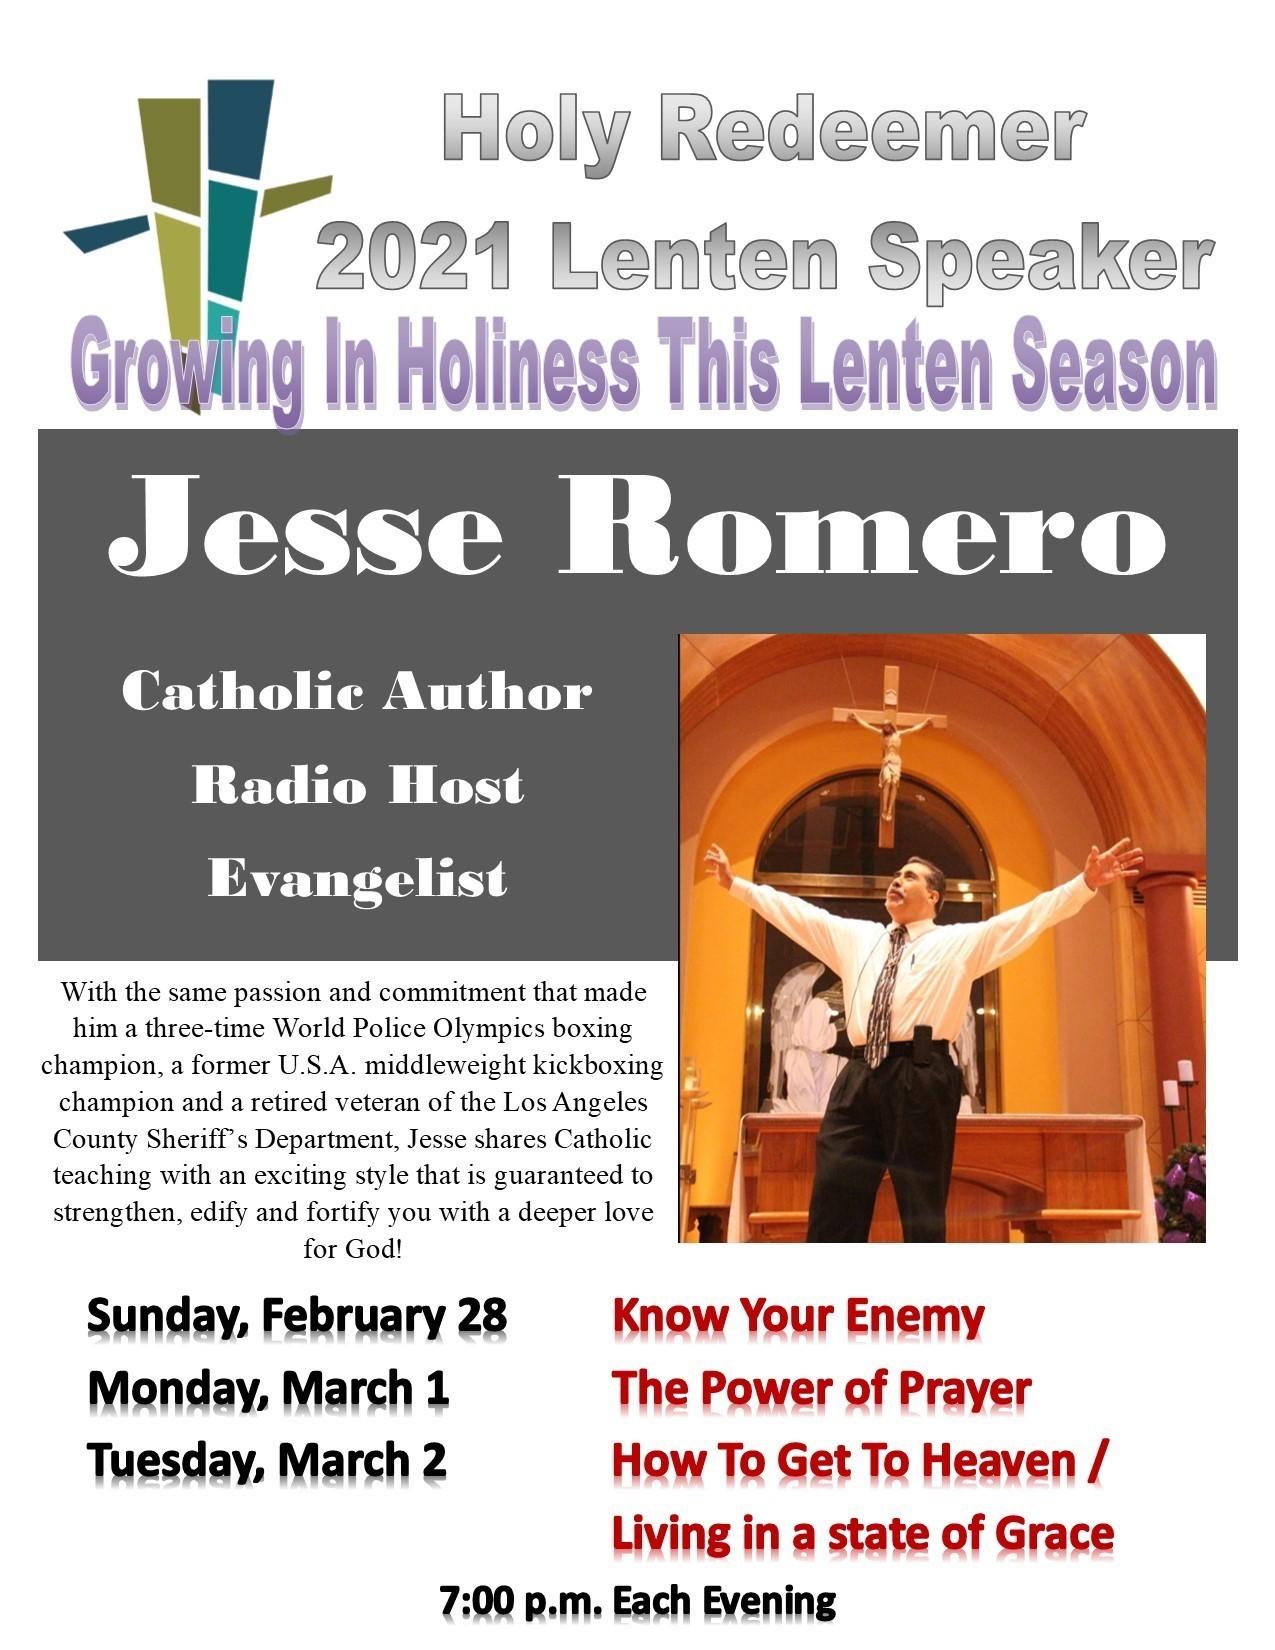 HOLY REDEEMER CATHOLIC CHURCH, NEW BREMEN, OHIO